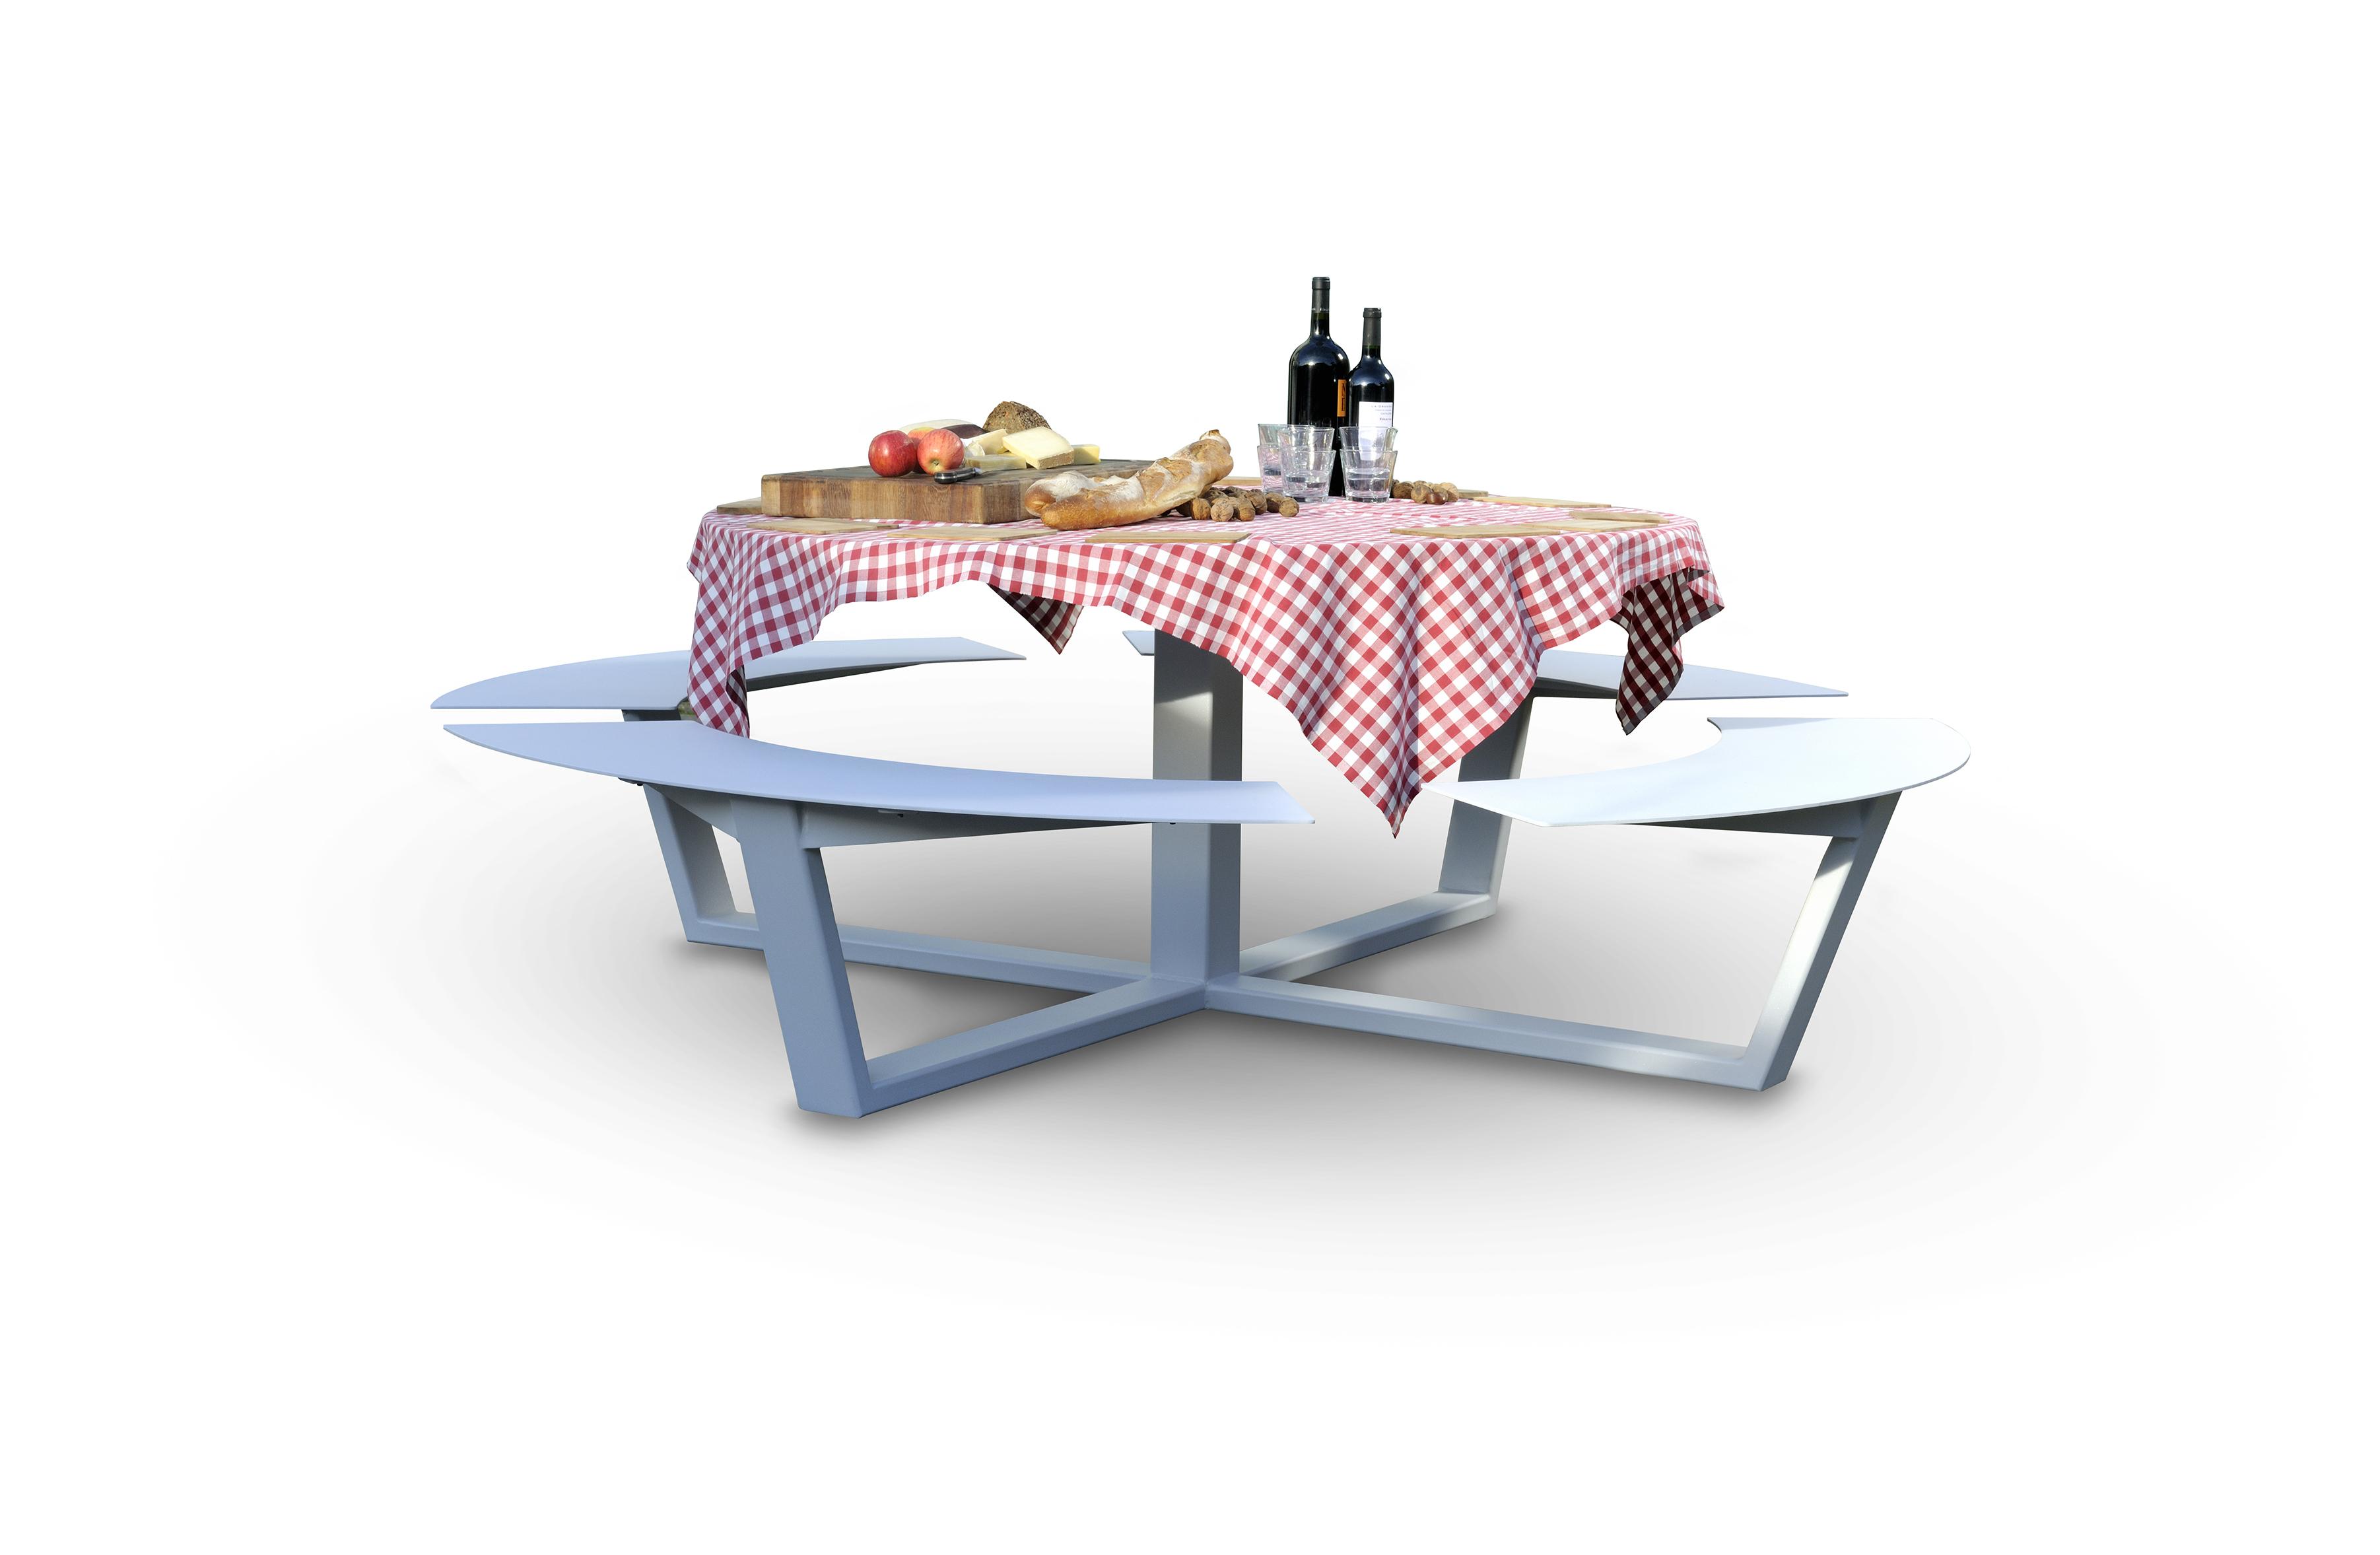 la grande ronde cassecroute handmade picnic tables. Black Bedroom Furniture Sets. Home Design Ideas